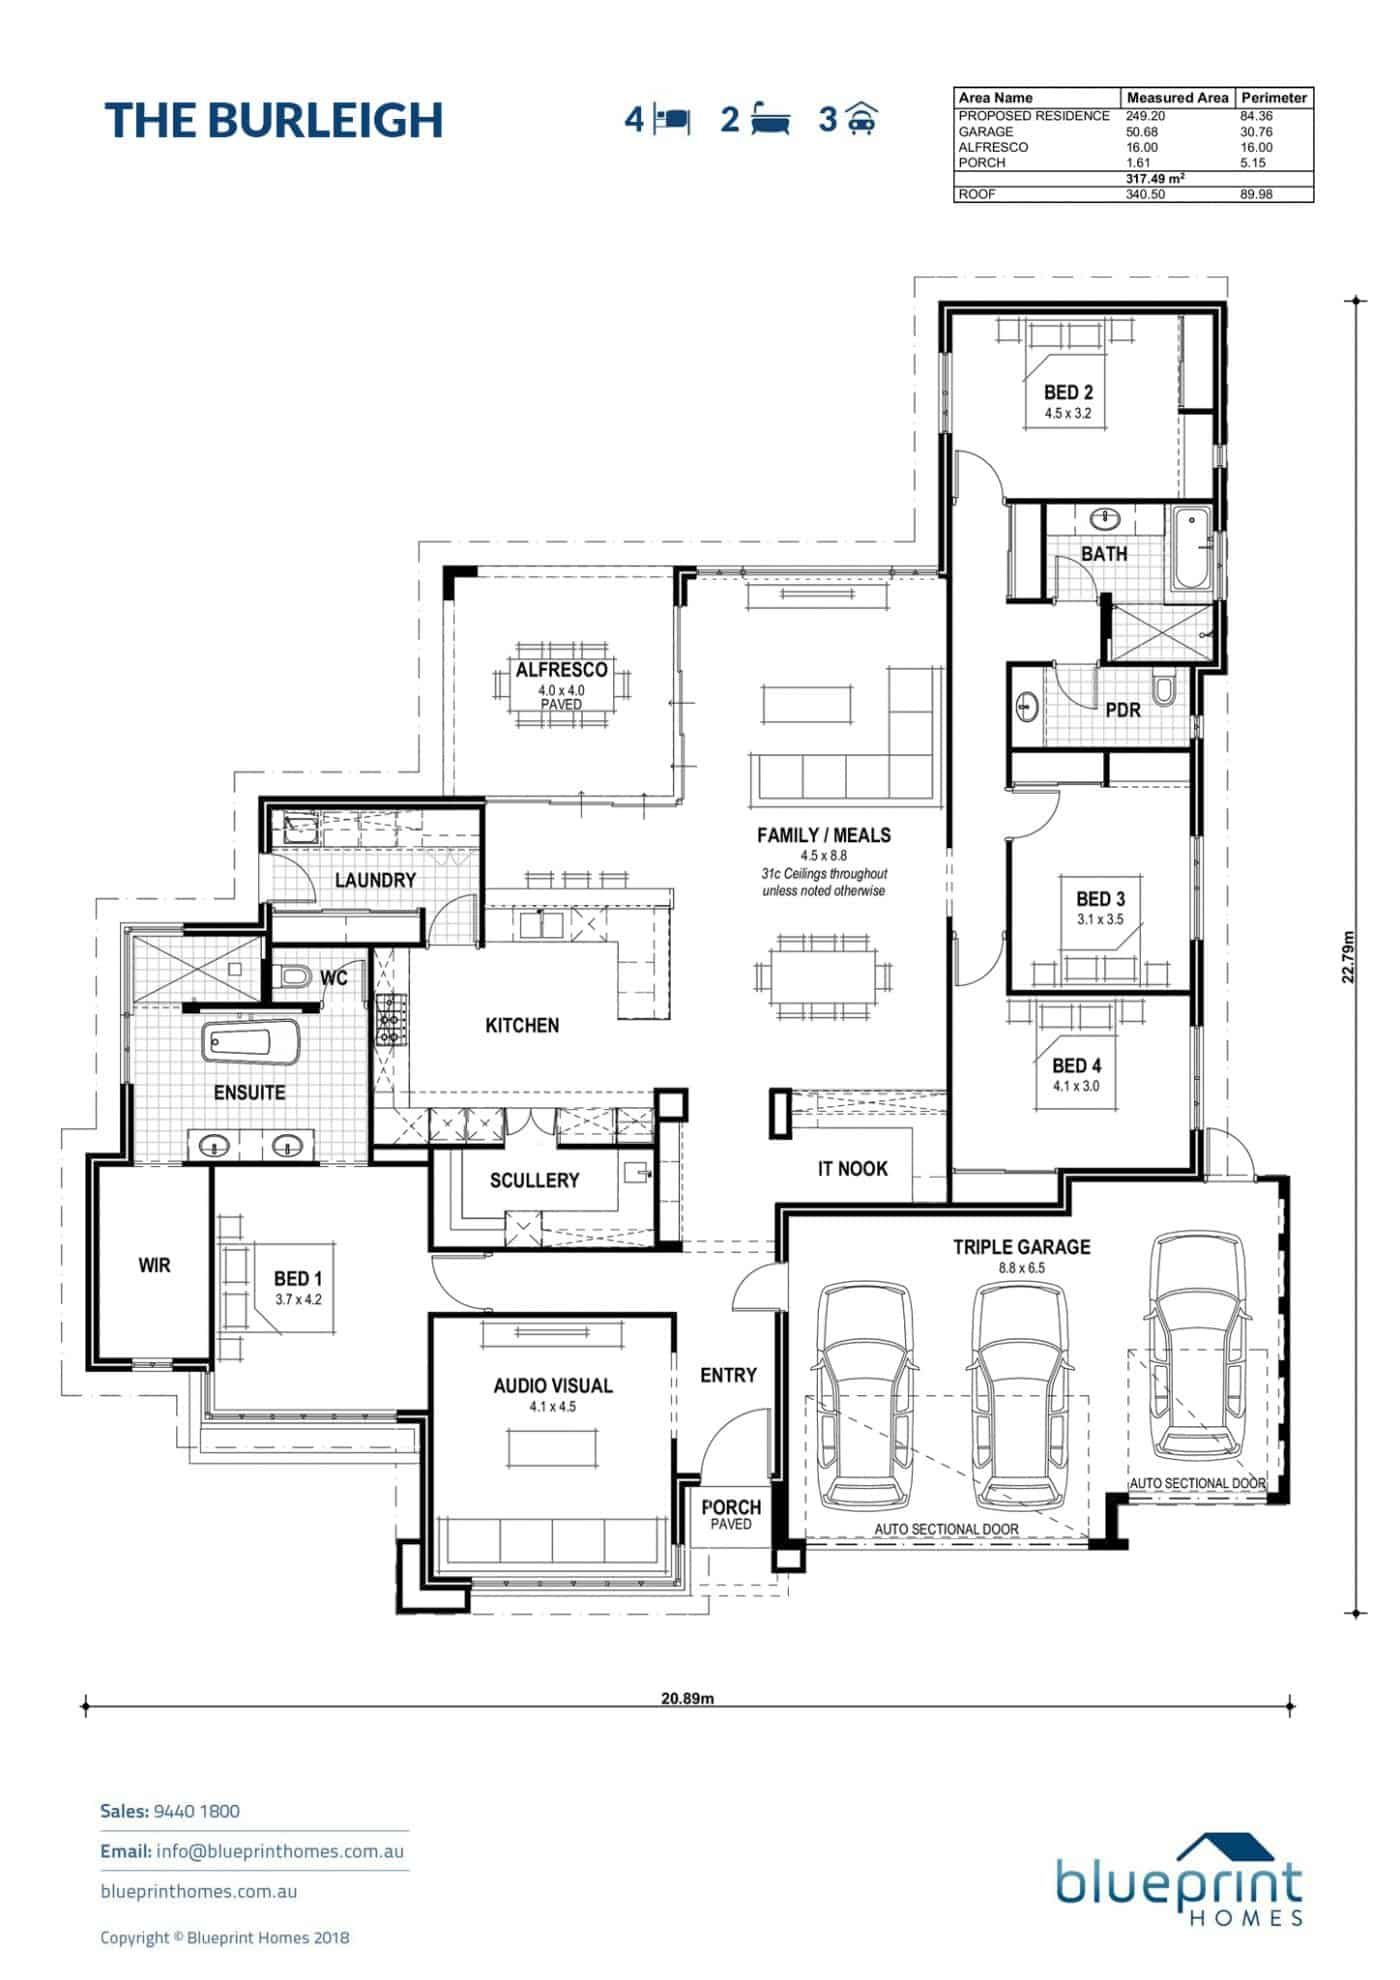 Burns Beach Display Home Perth The Burleigh In 2020 Floor Plans Dream House Plans Best House Plans